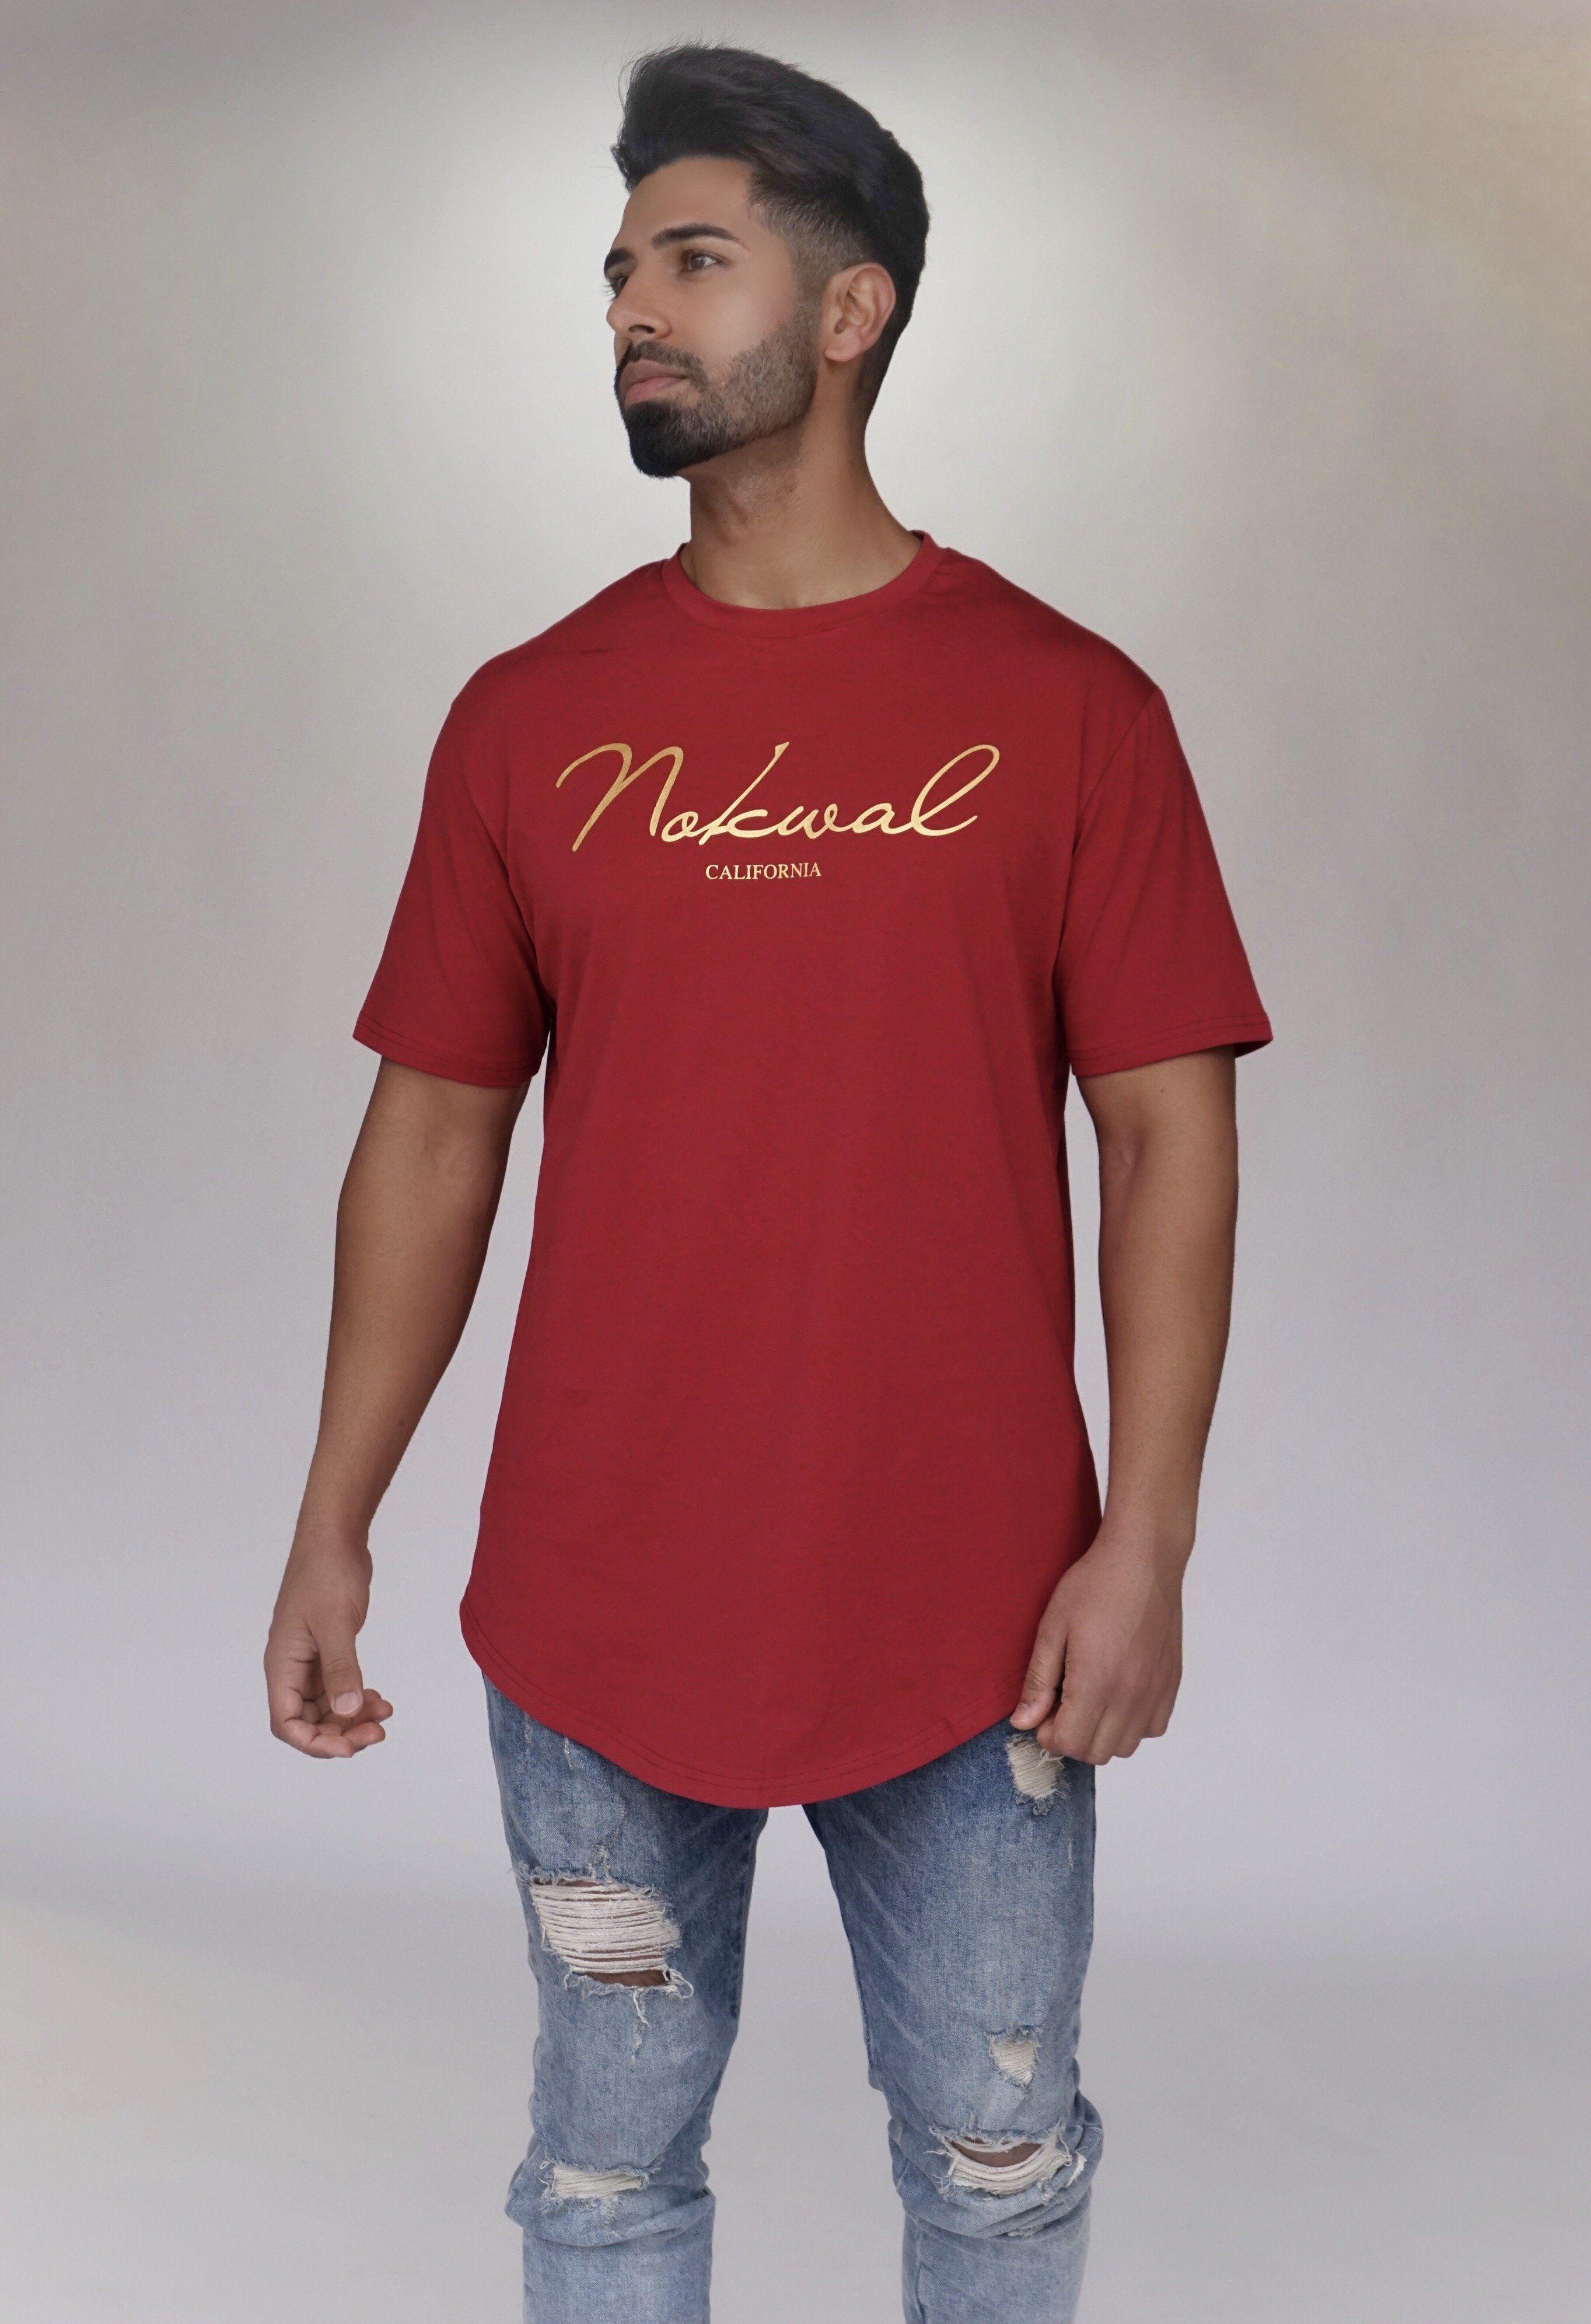 6b9f95a9 Nokwal Golden Signature T-Shirt - Maroon | clothes | T shirt, Shirts ...